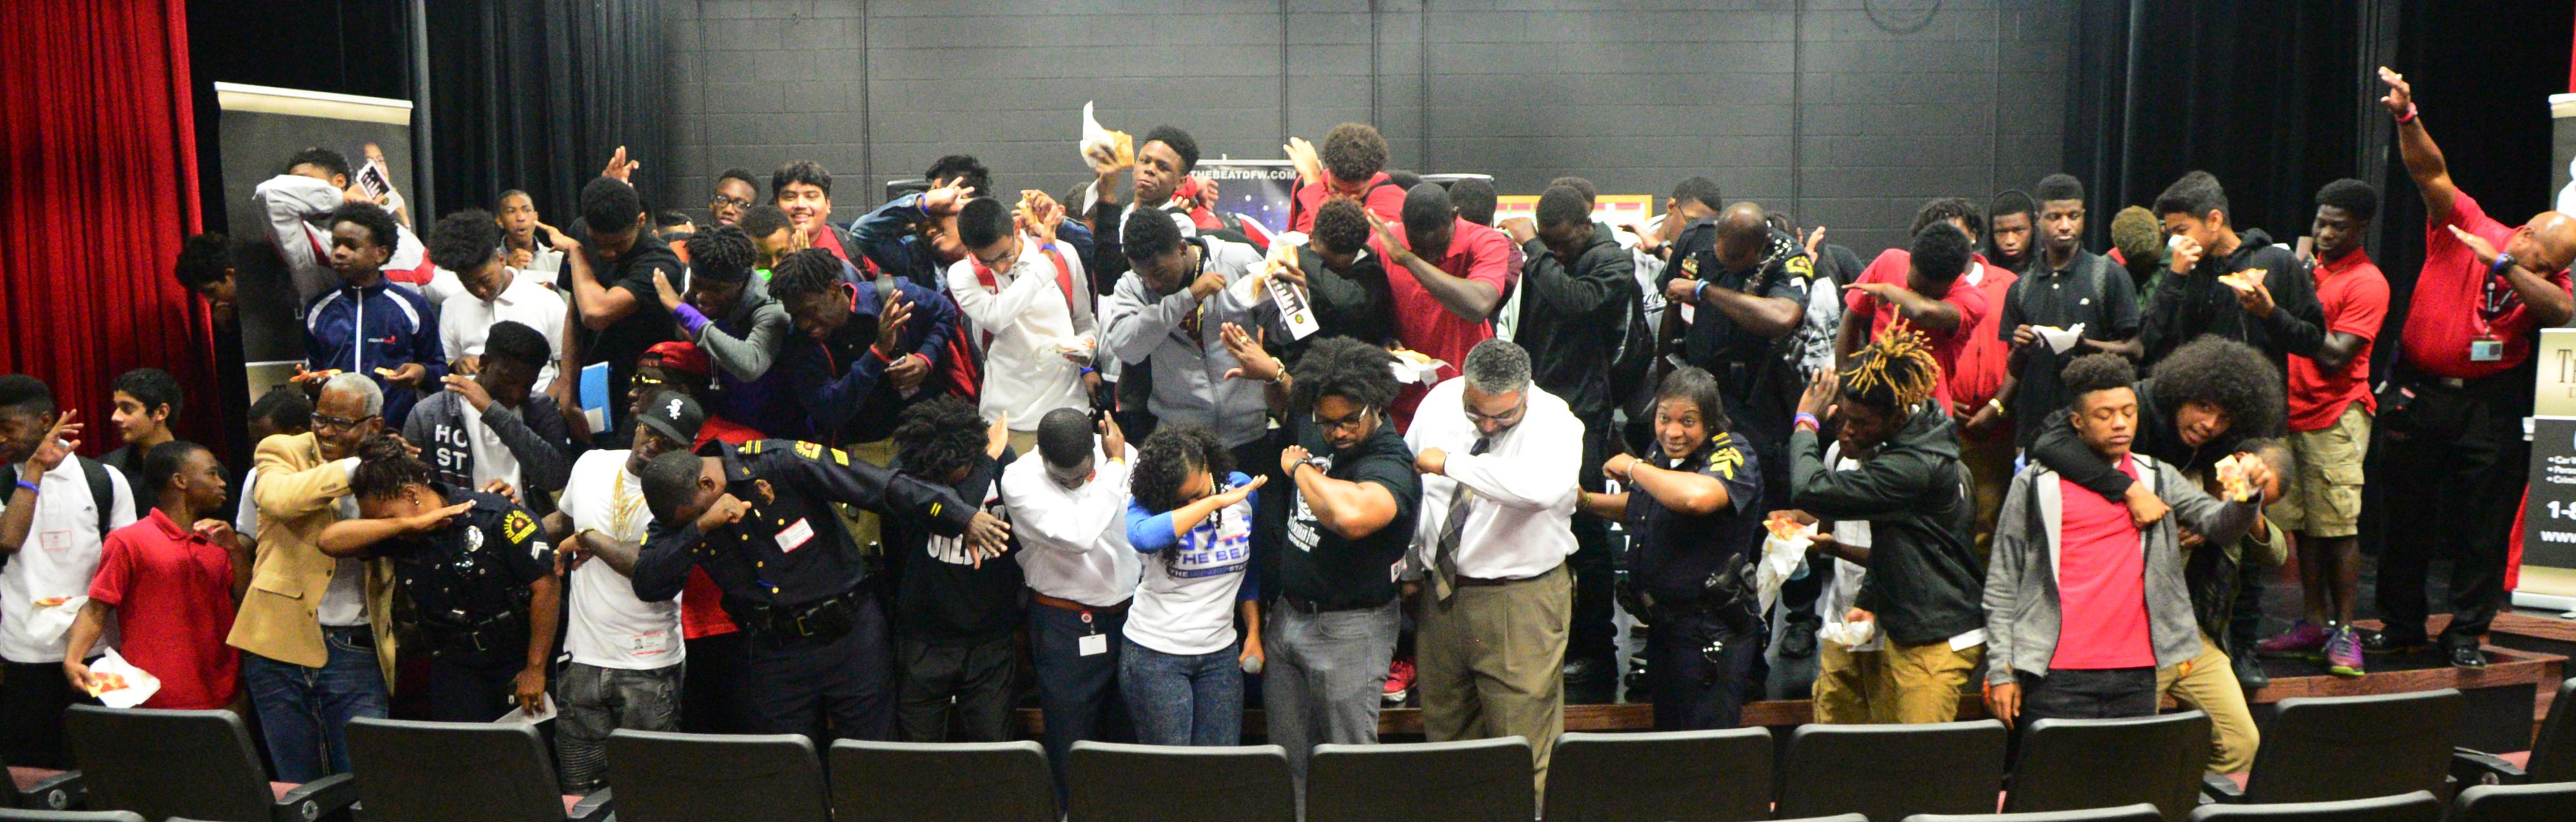 The Cochran Firm Barber Shop Talk Cedar High School